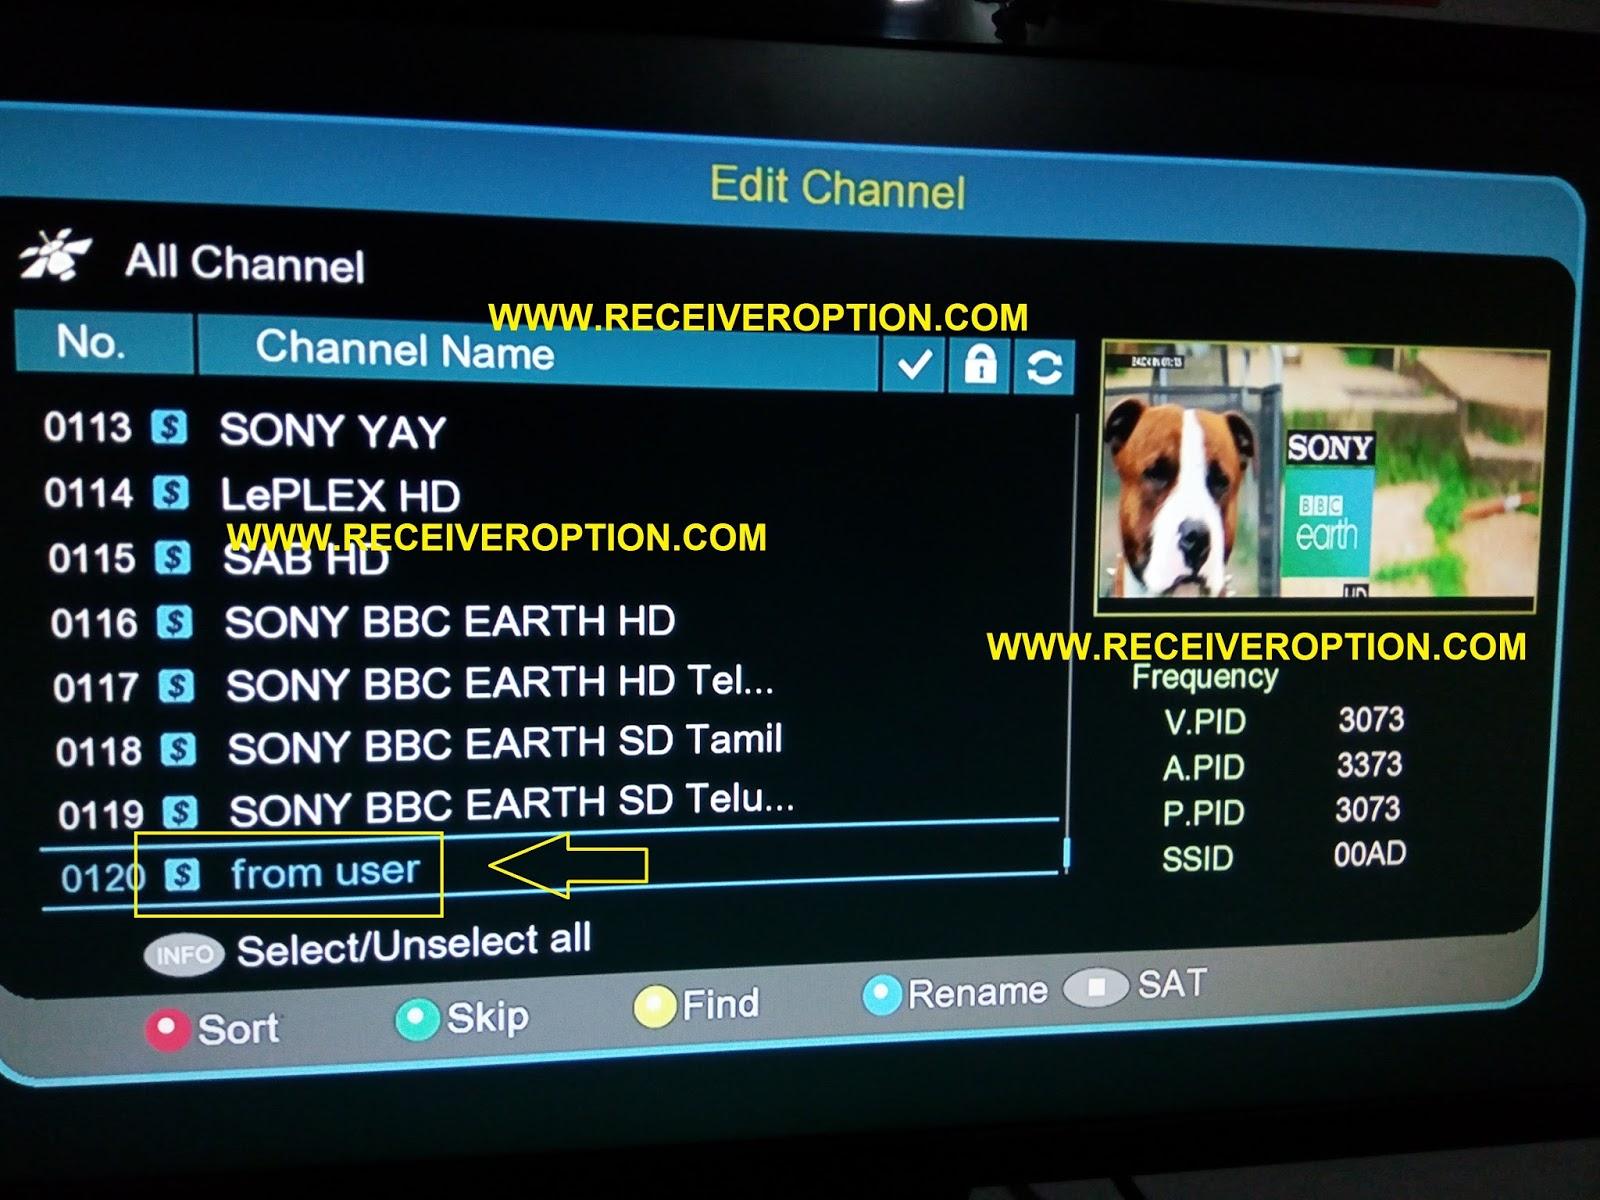 ECHOLINK 770D HD RECEIVER POWERVU KEY OPTION - HOW TO ENTER